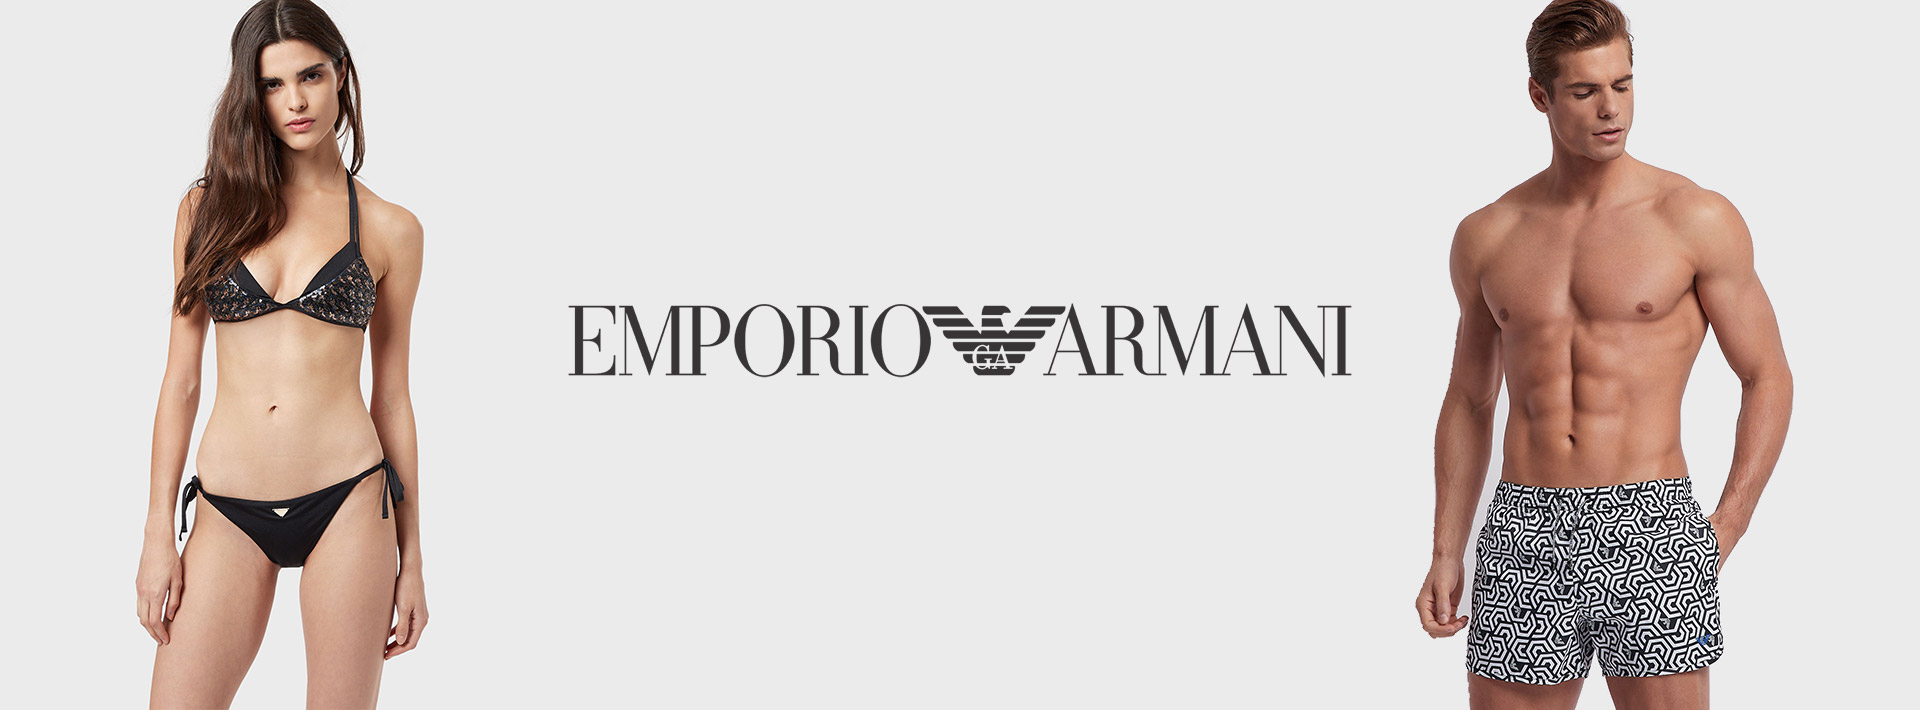 Emporio Armani Swimwear - Unionmoda Outlet